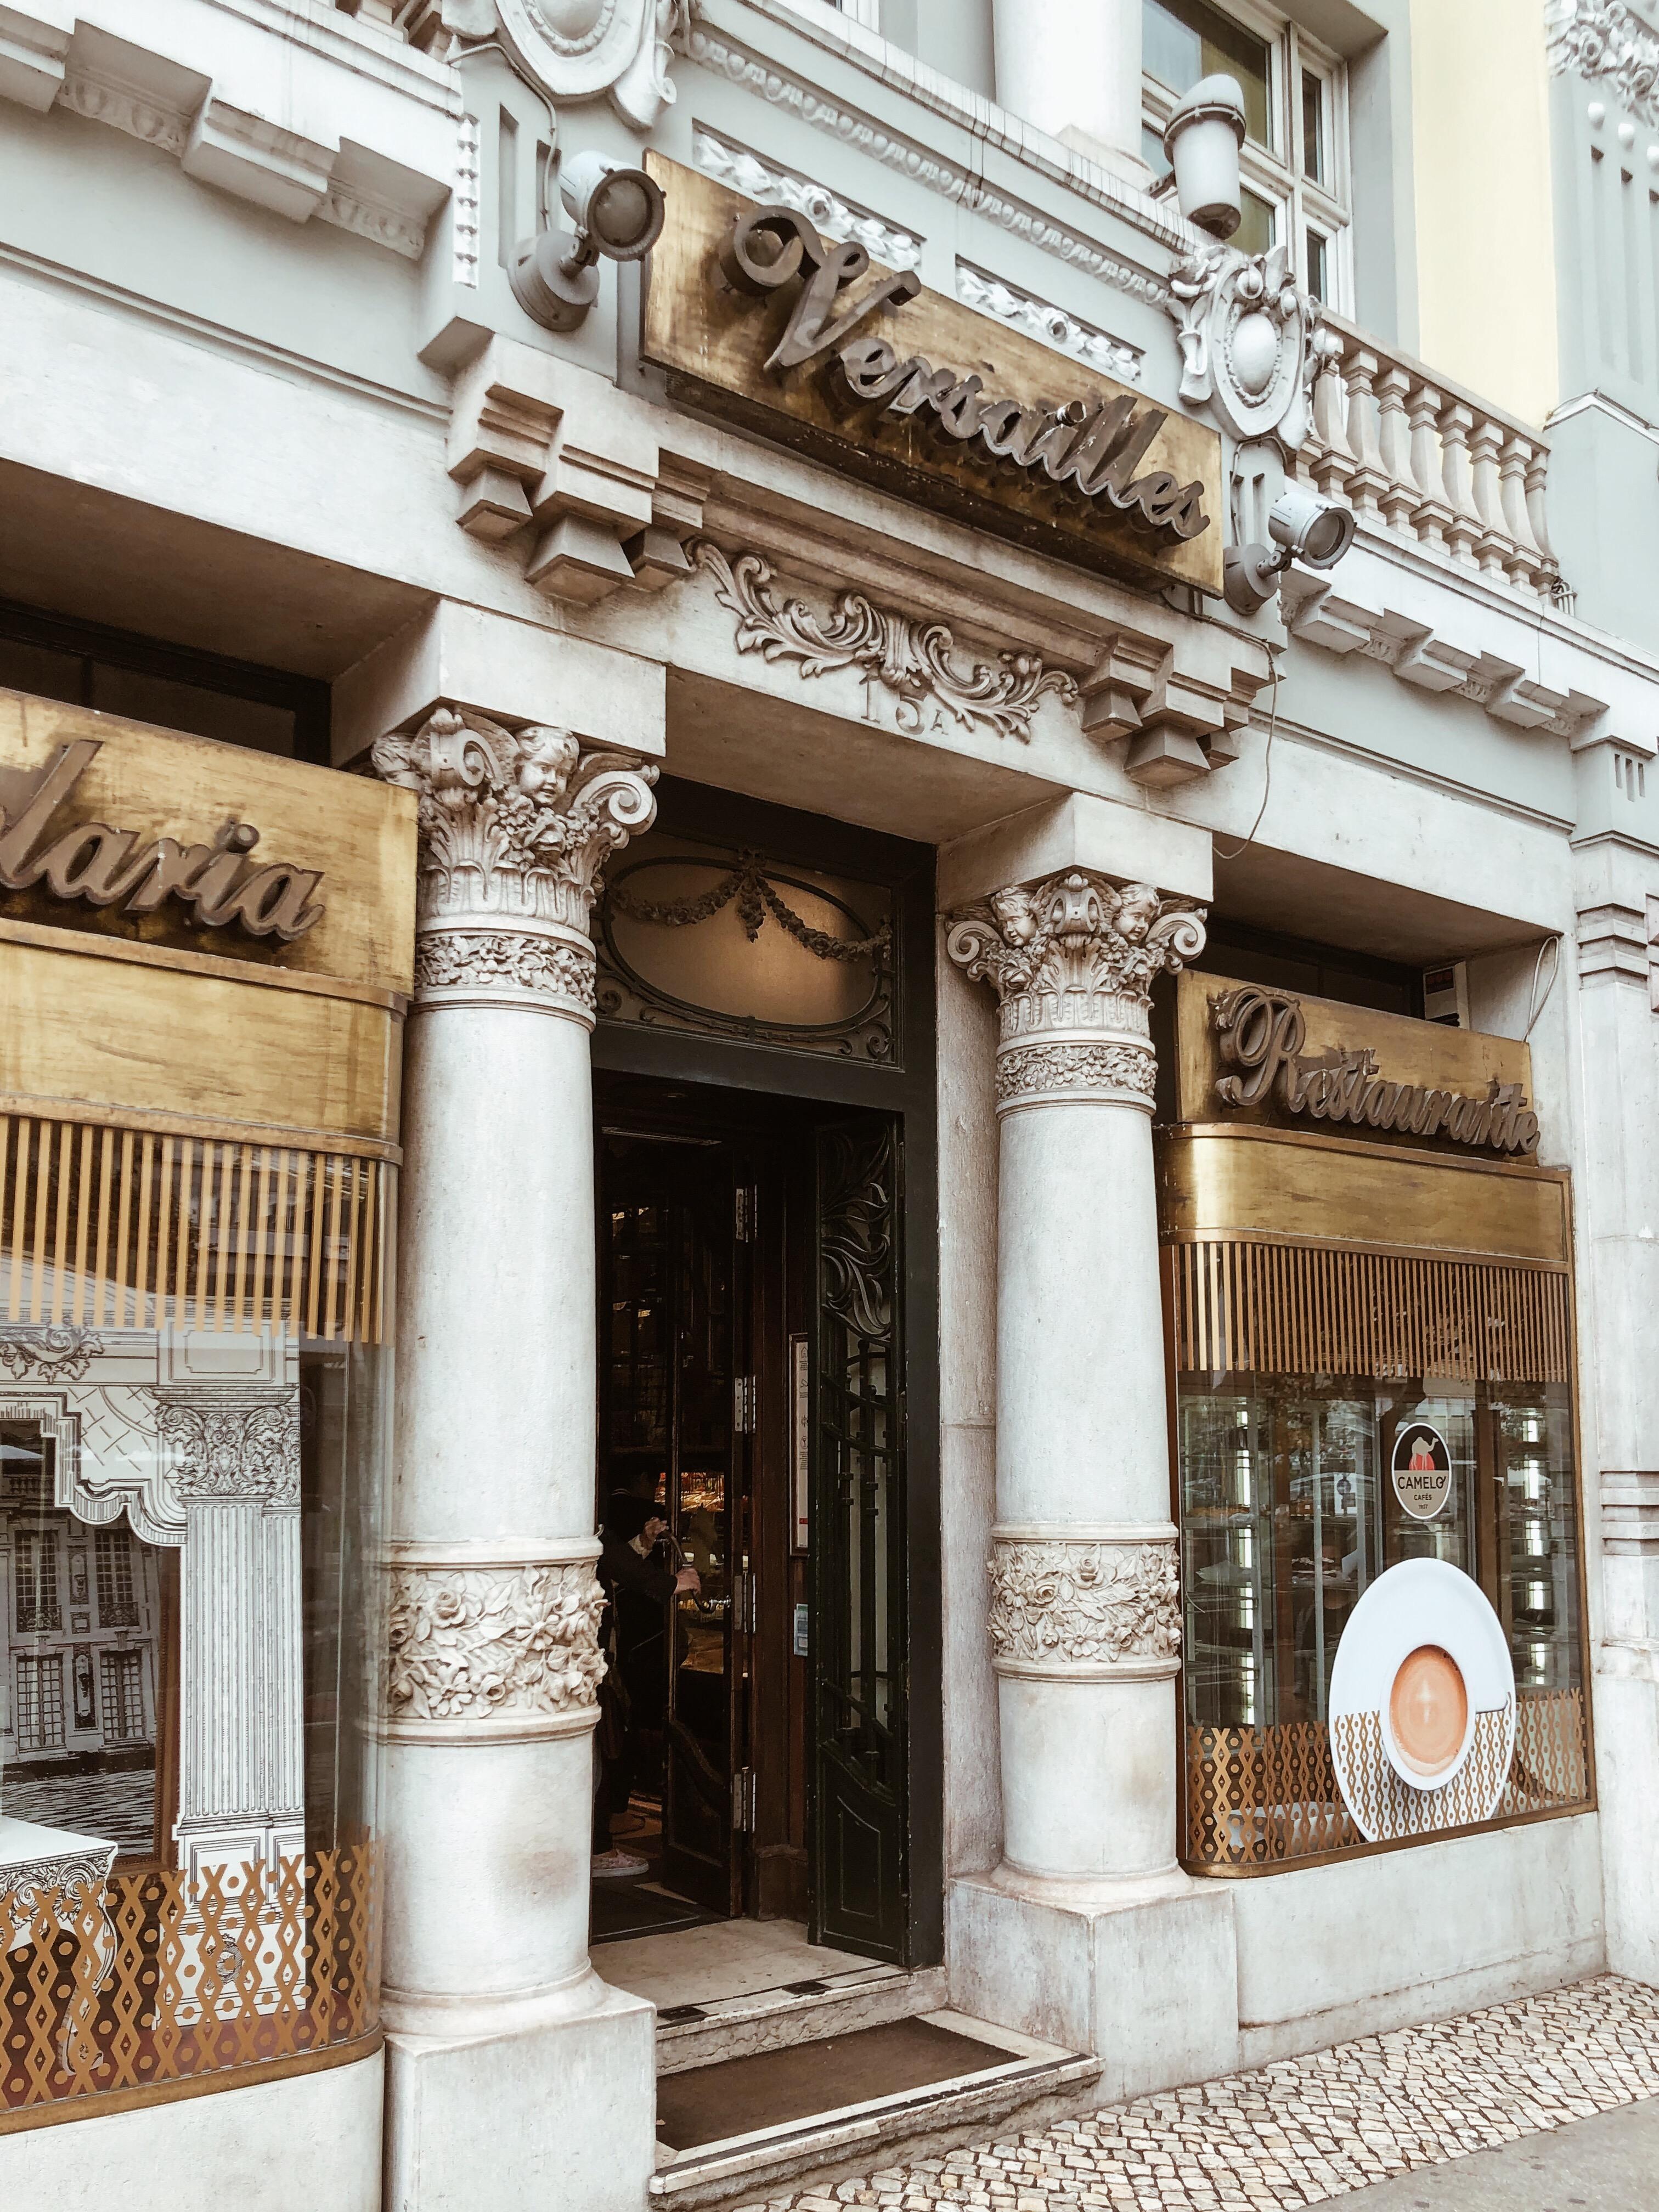 Pastelaria-Versailles-Lisboa